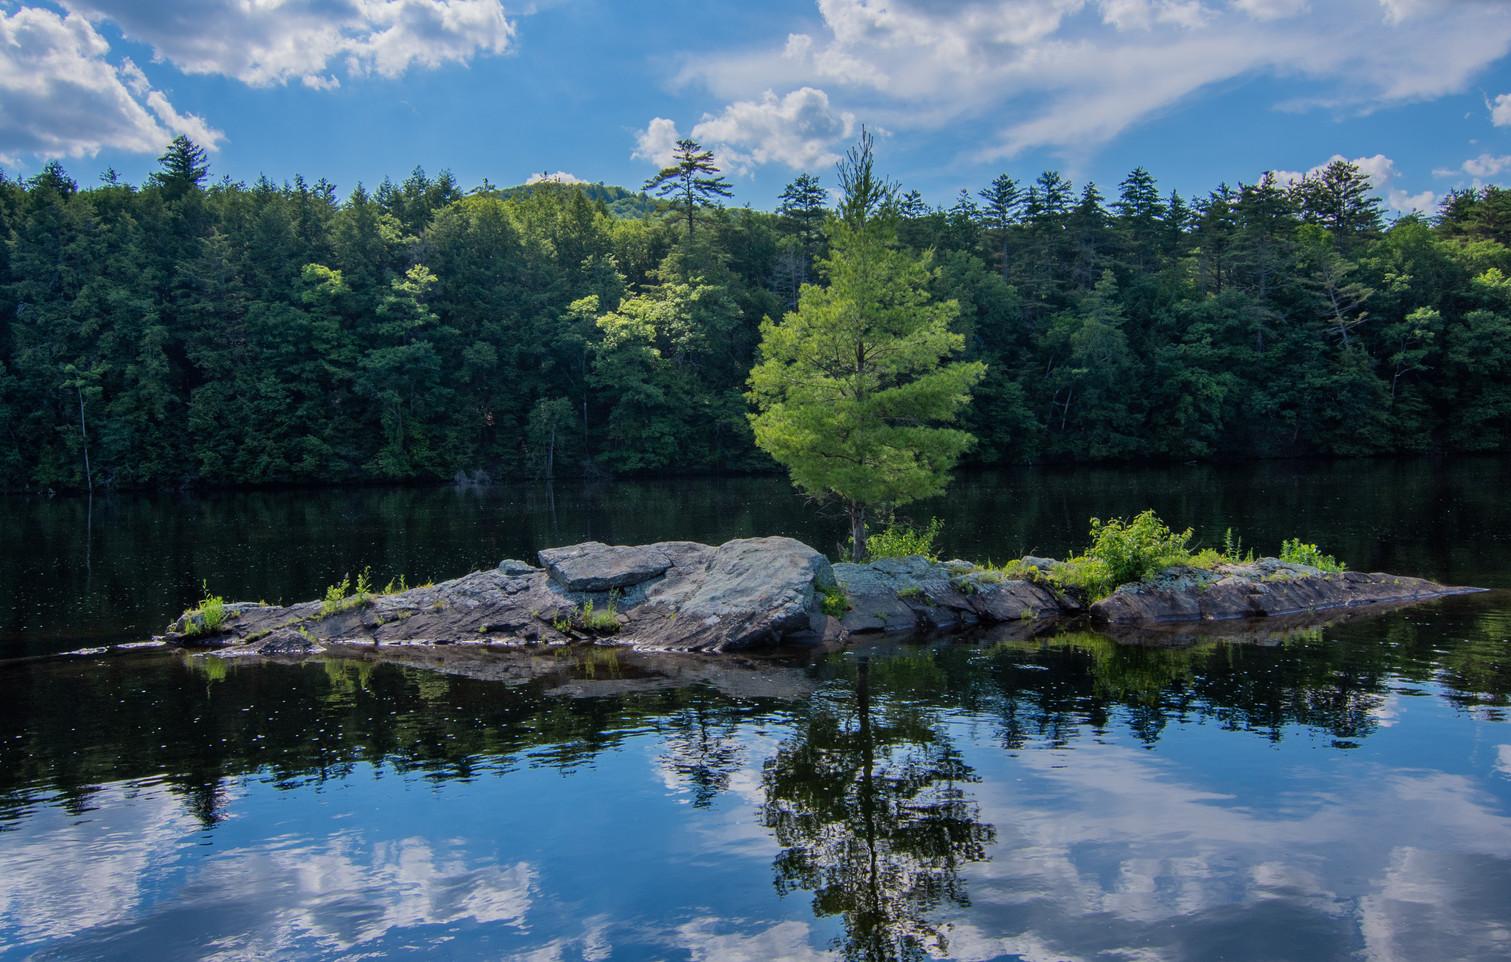 Adirondack Life Noxon Photography-9.jpg